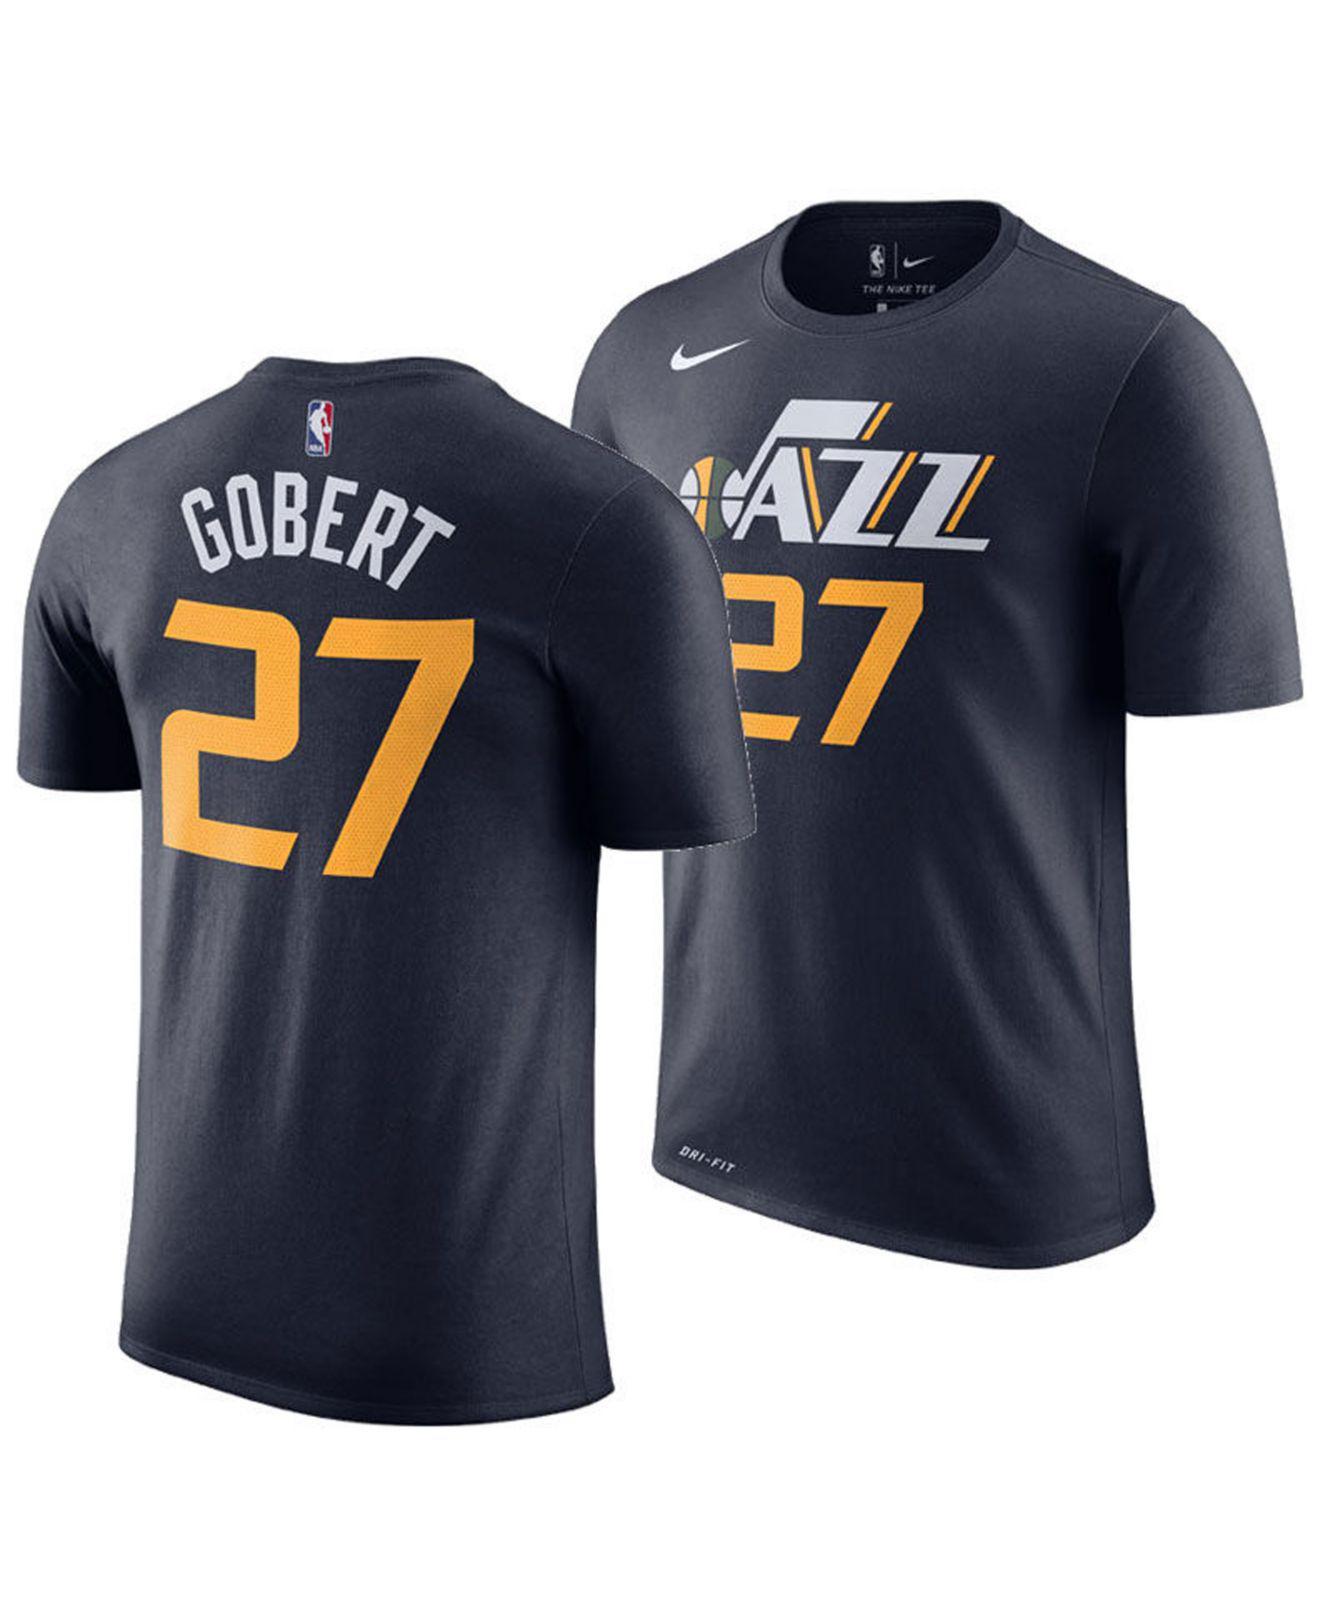 Lyst - Nike Rudy Gobert Utah Jazz Icon Player T-shirt in Blue for Men d615b848d